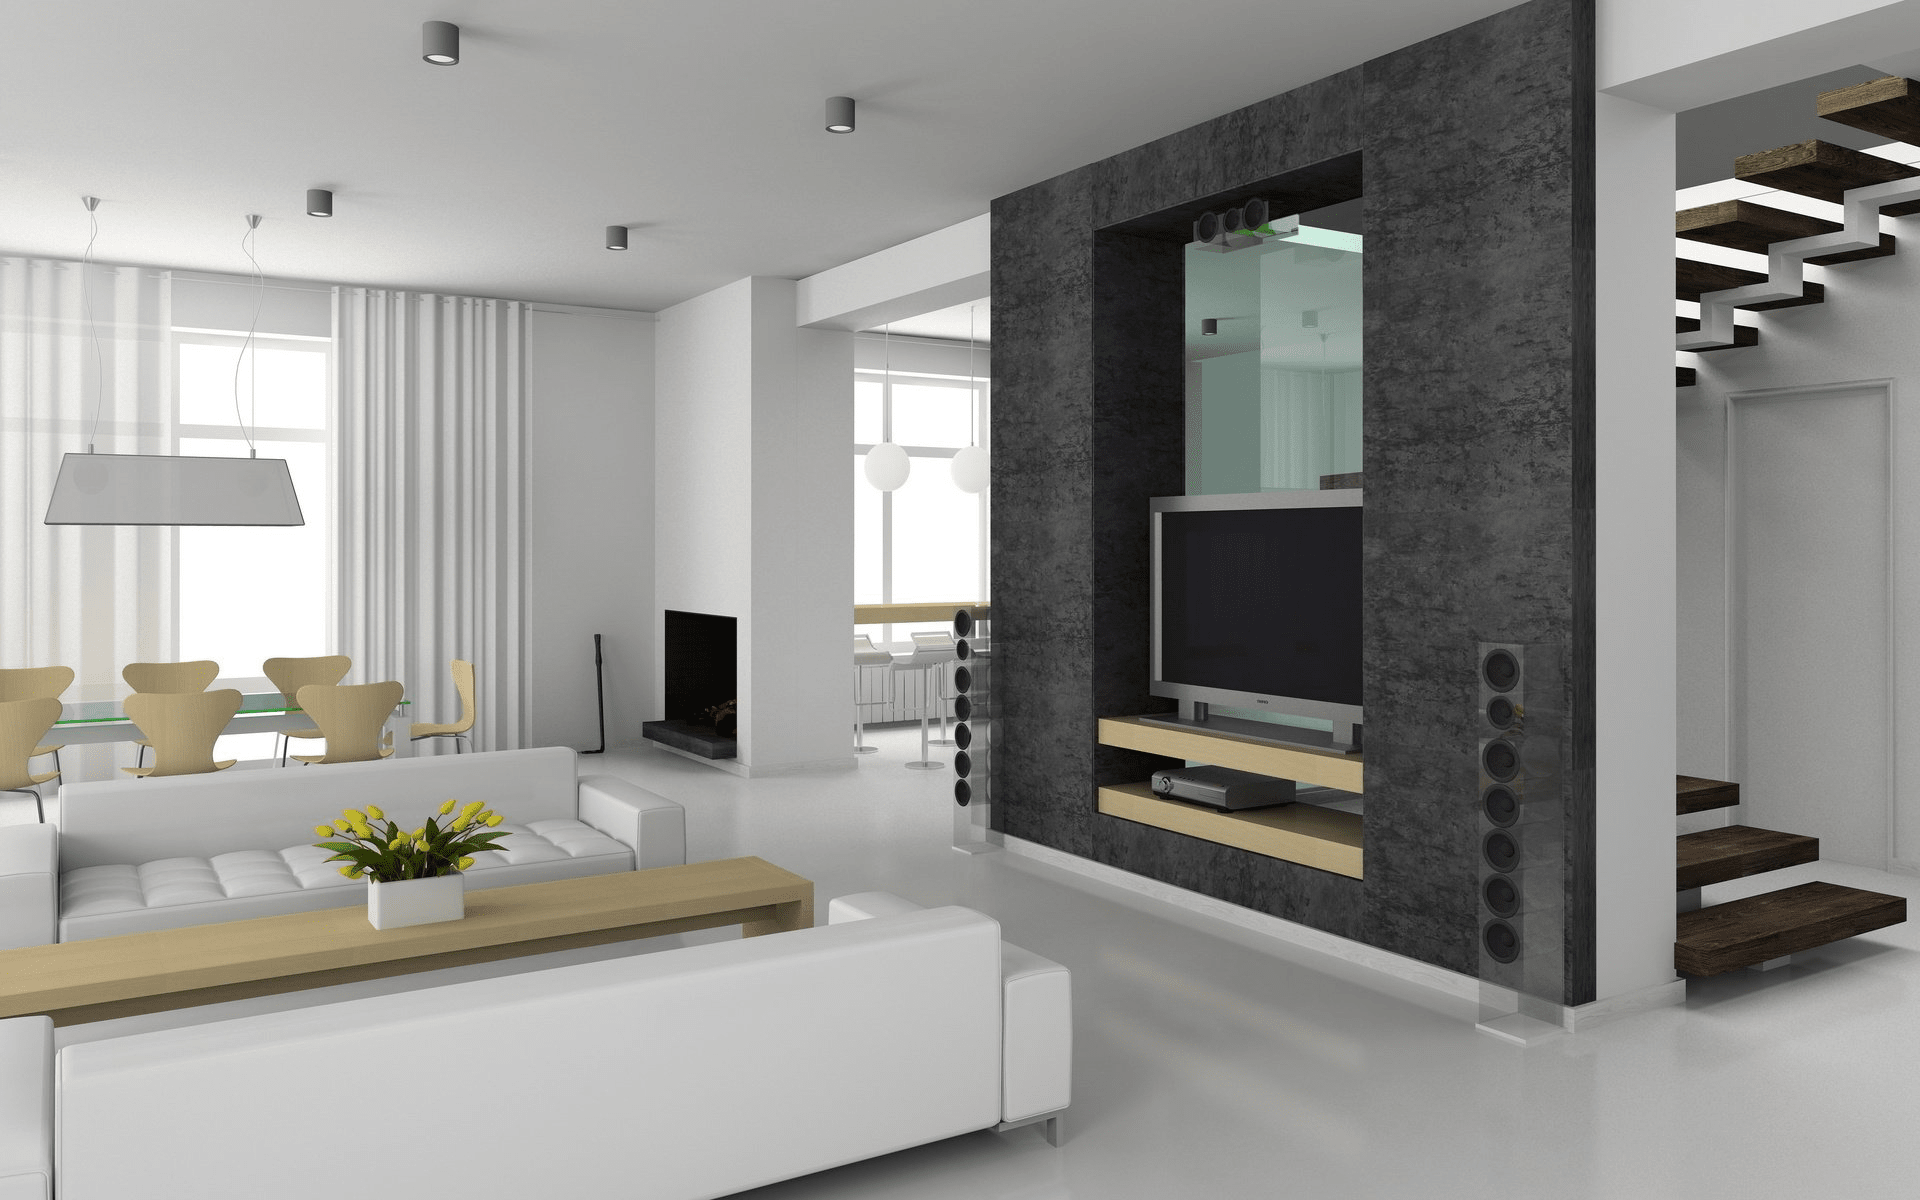 Дизайн домов - Модерн